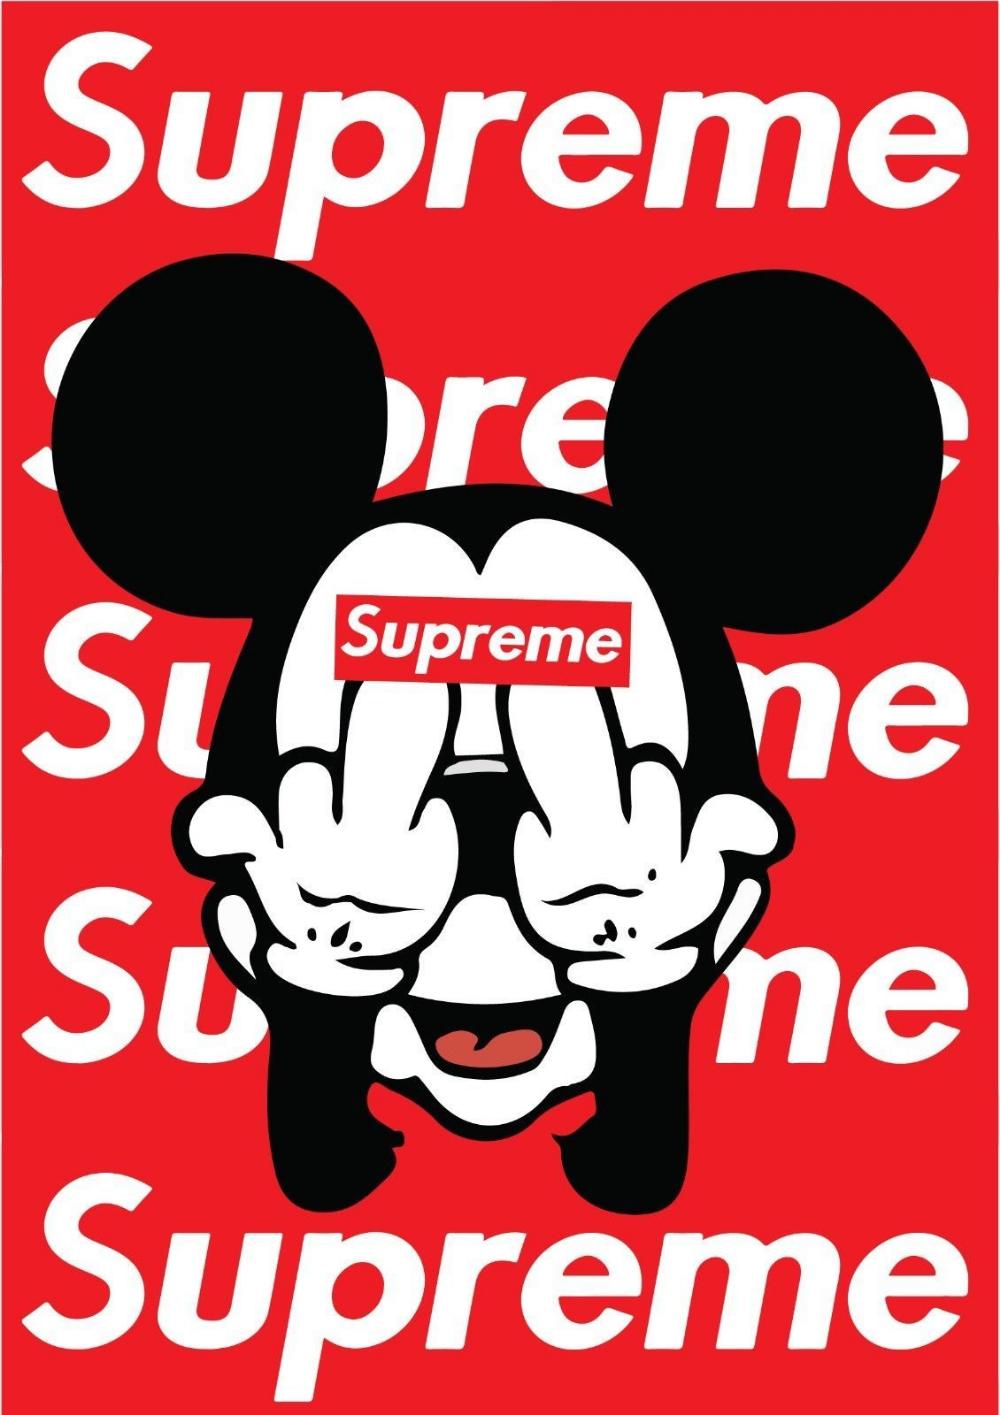 Supreme Hypebeast Poster Minimalist Posters In 2020 Minimalist